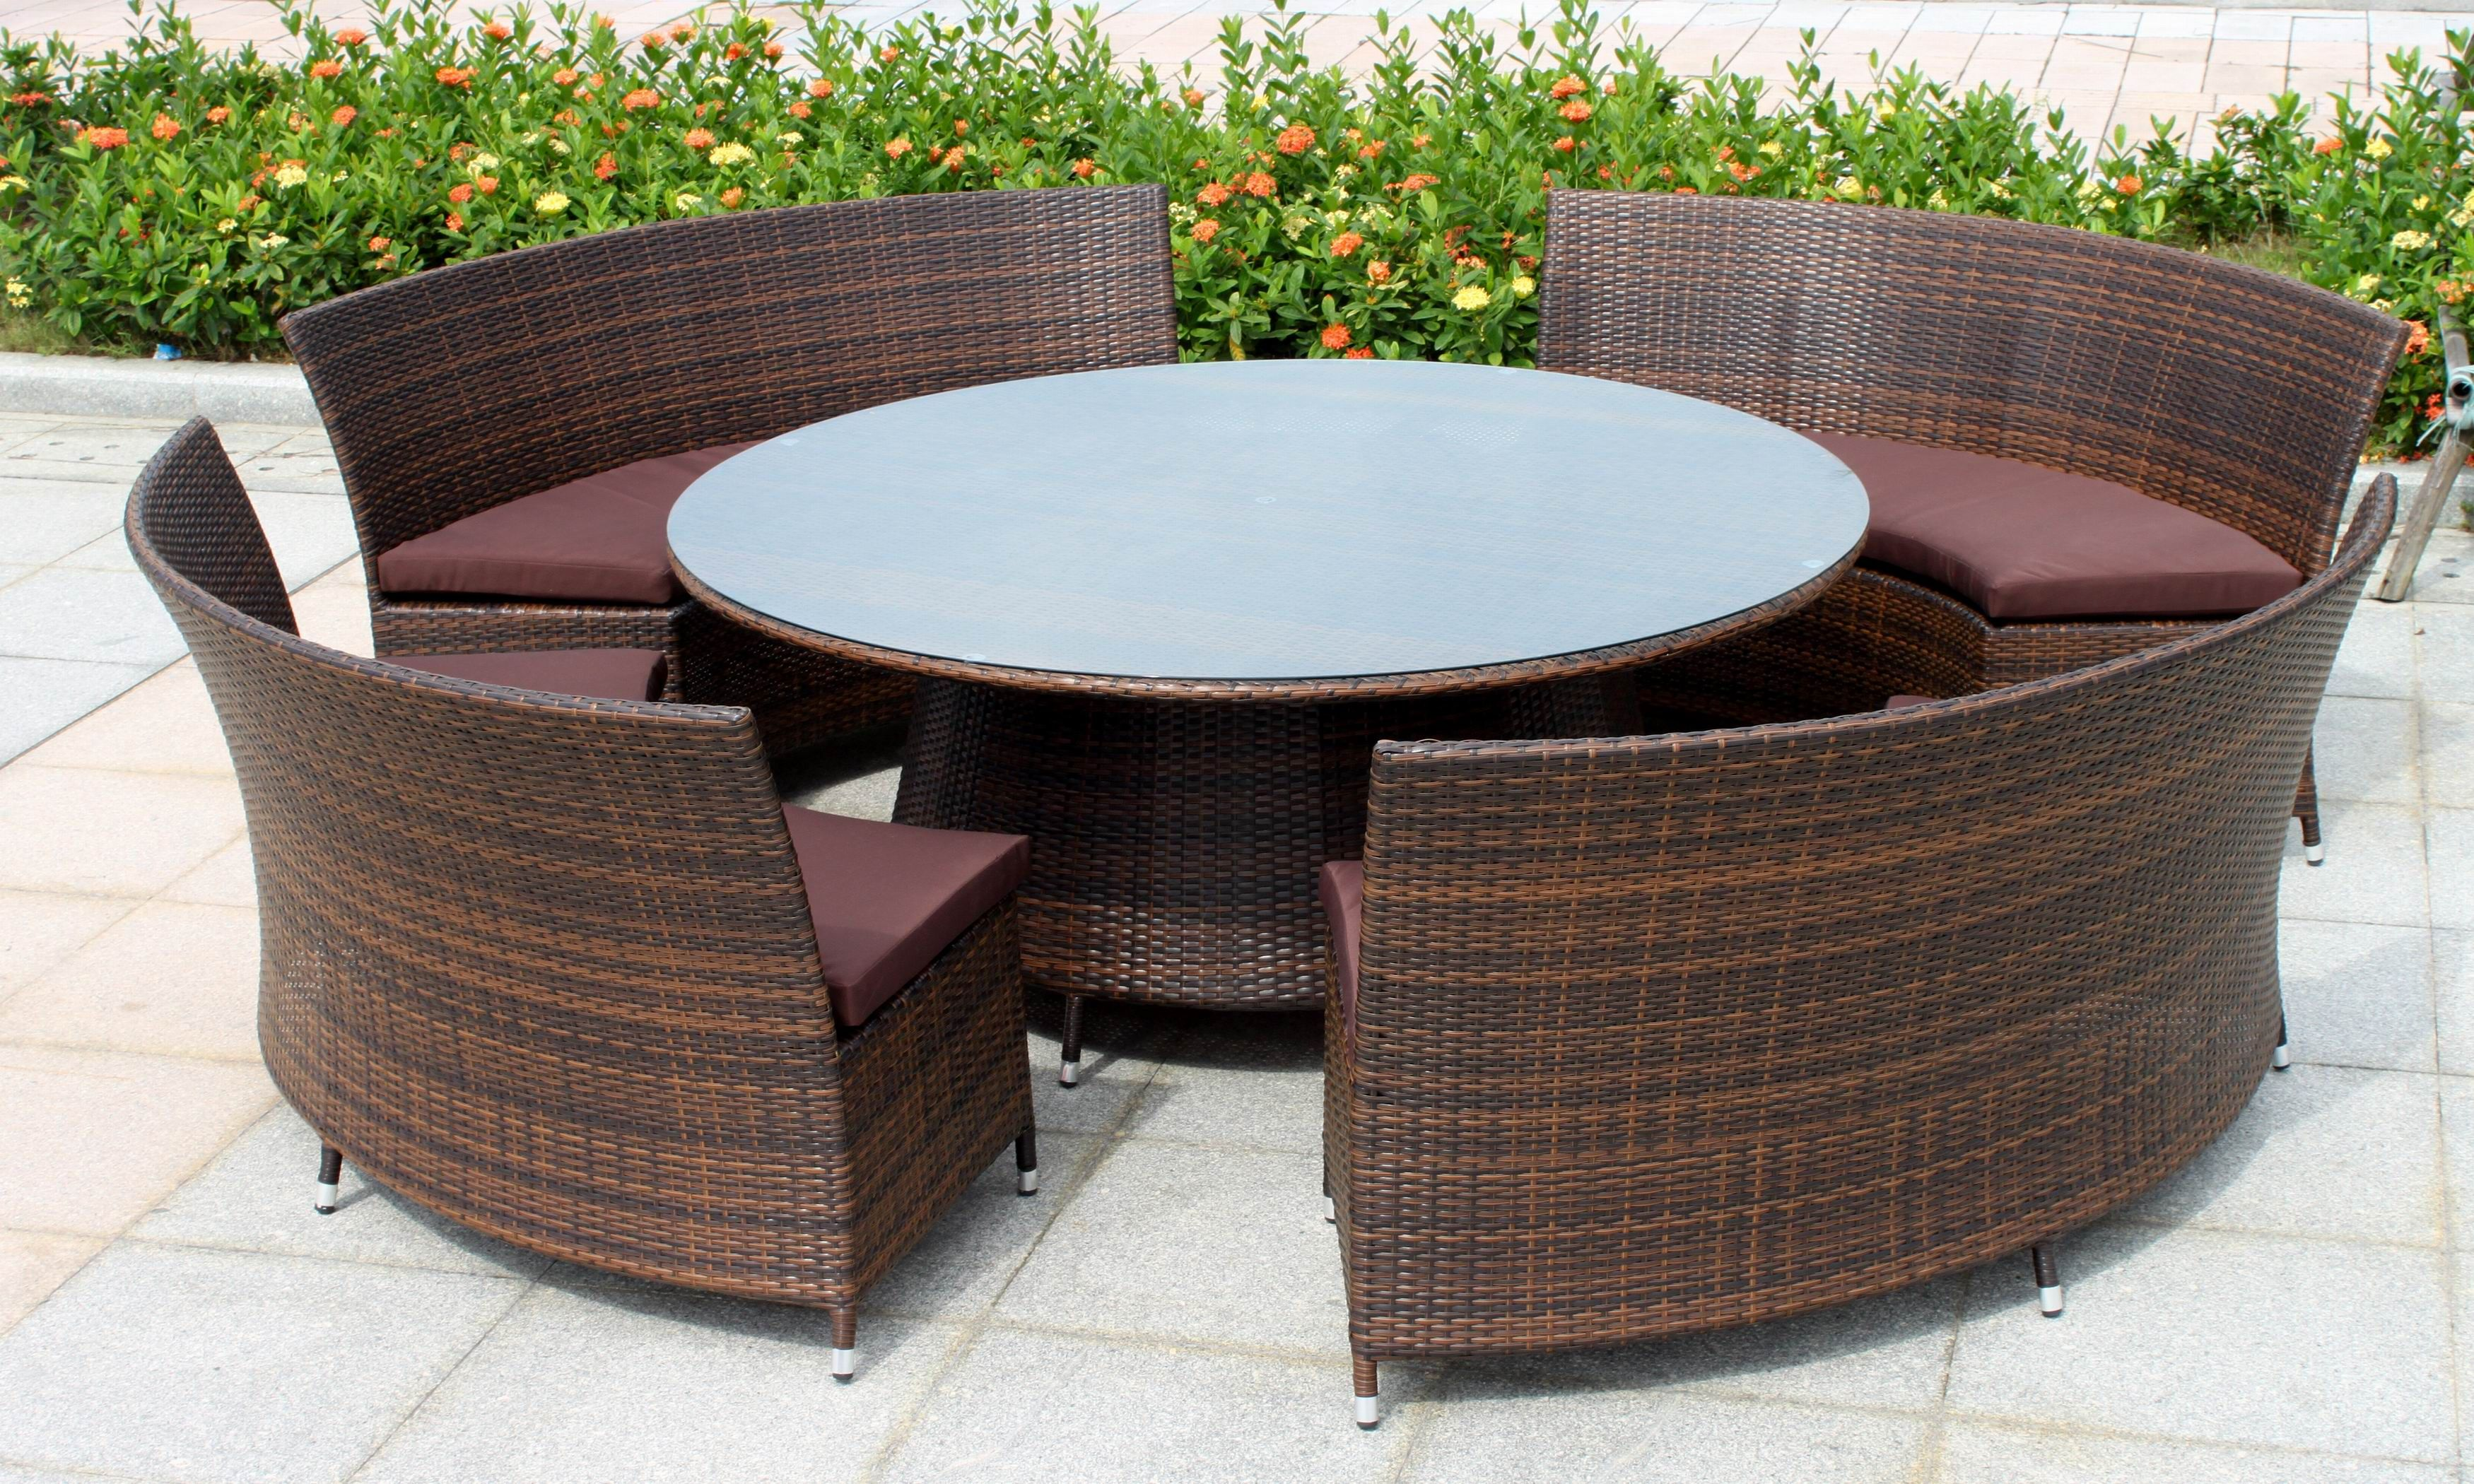 Patio Furniture Sets Clearance Sale Costco Patio Resin Wicker